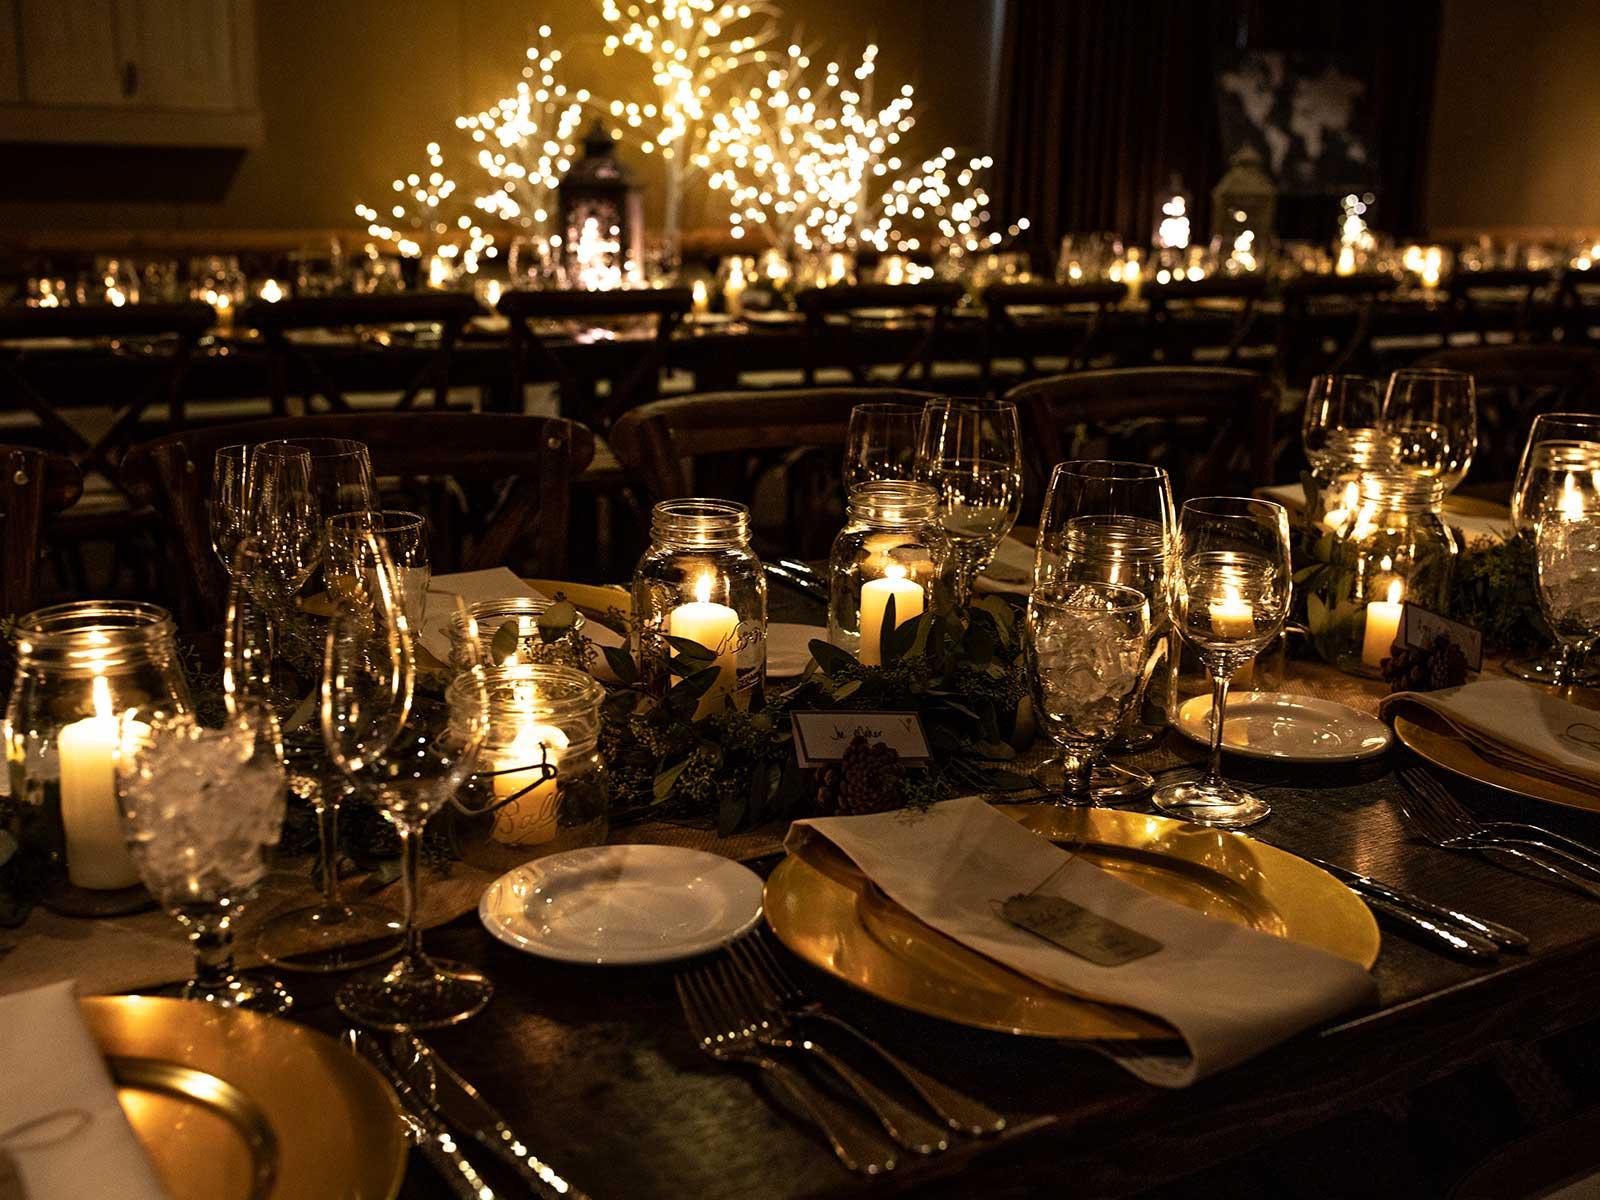 kristen jon wedding table by candlelight